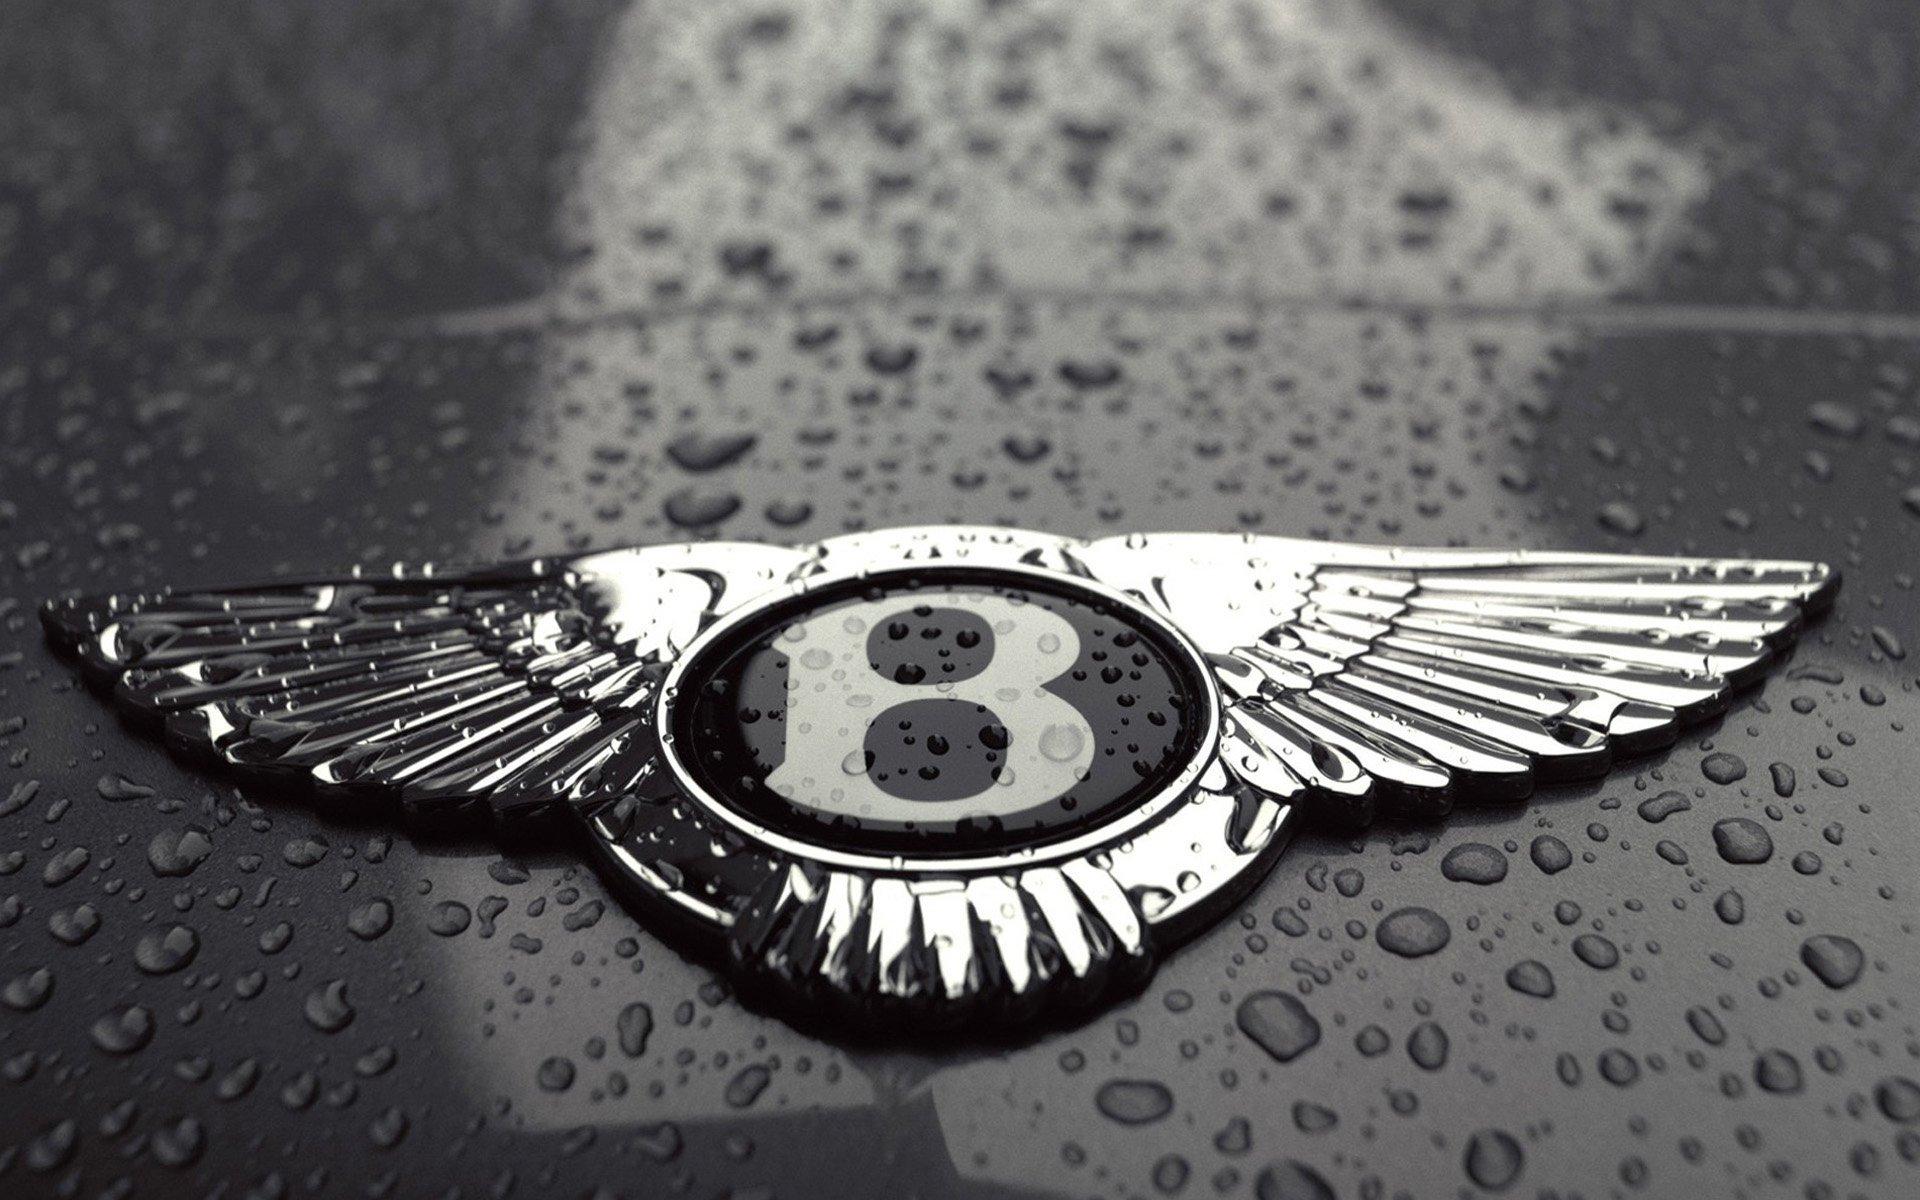 Бентли представил мощнейший спорткар континенталь GT